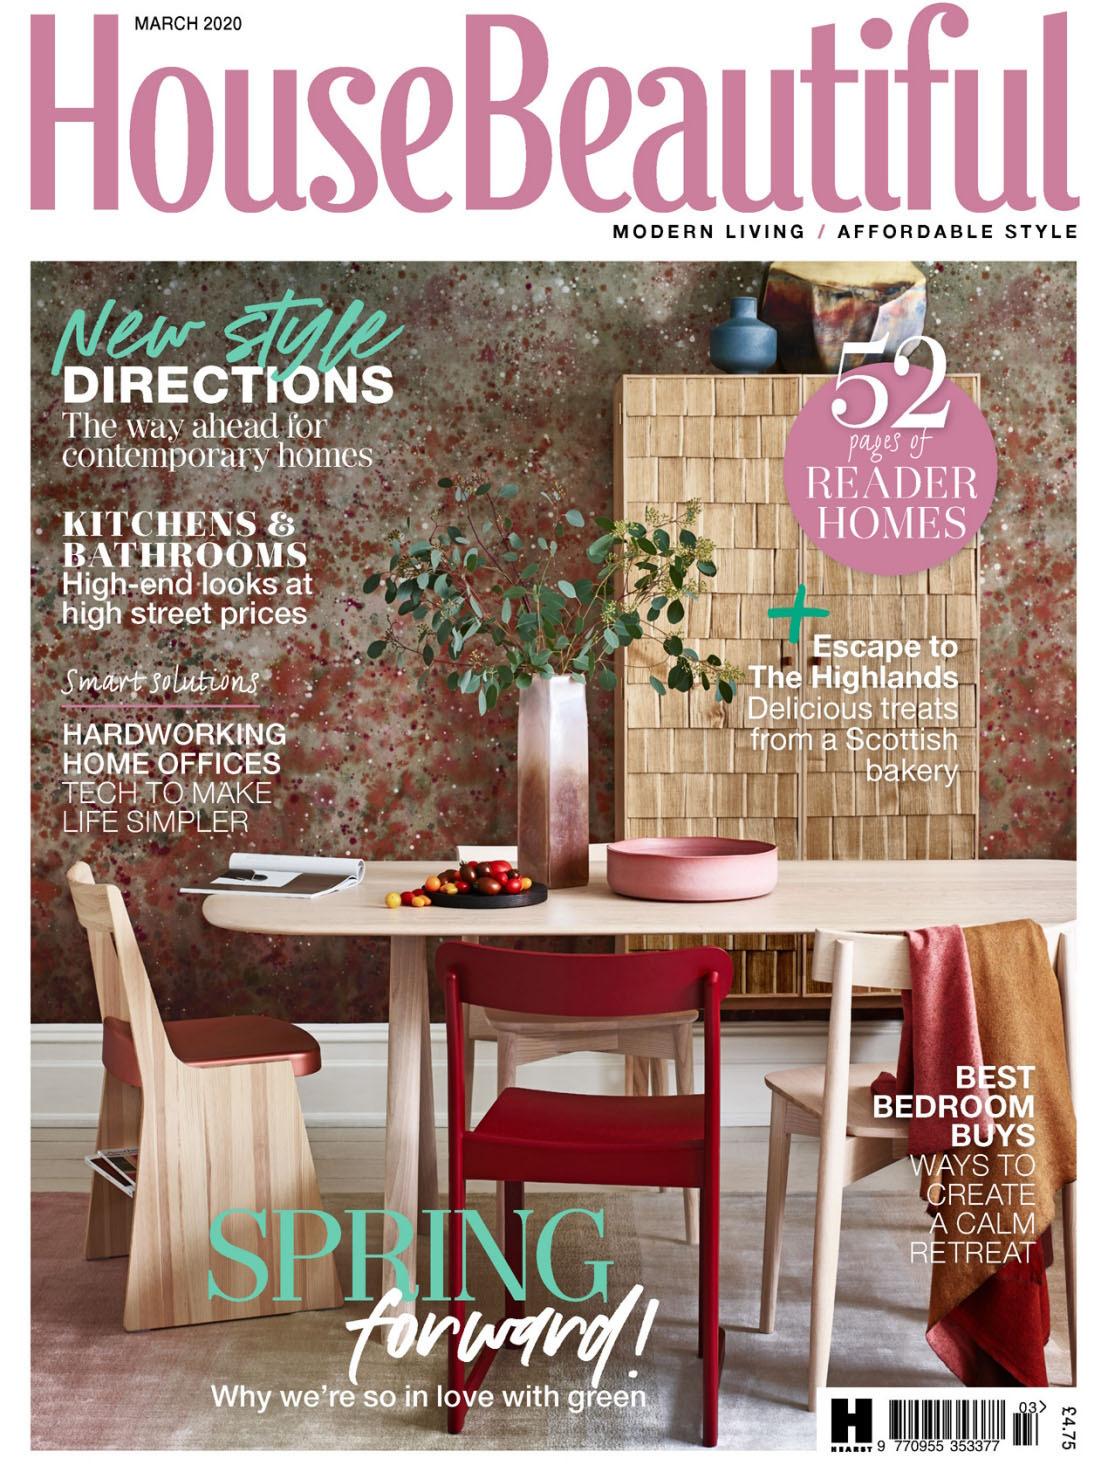 《House Beautiful》英国版时尚家居设计杂志2020年03月号